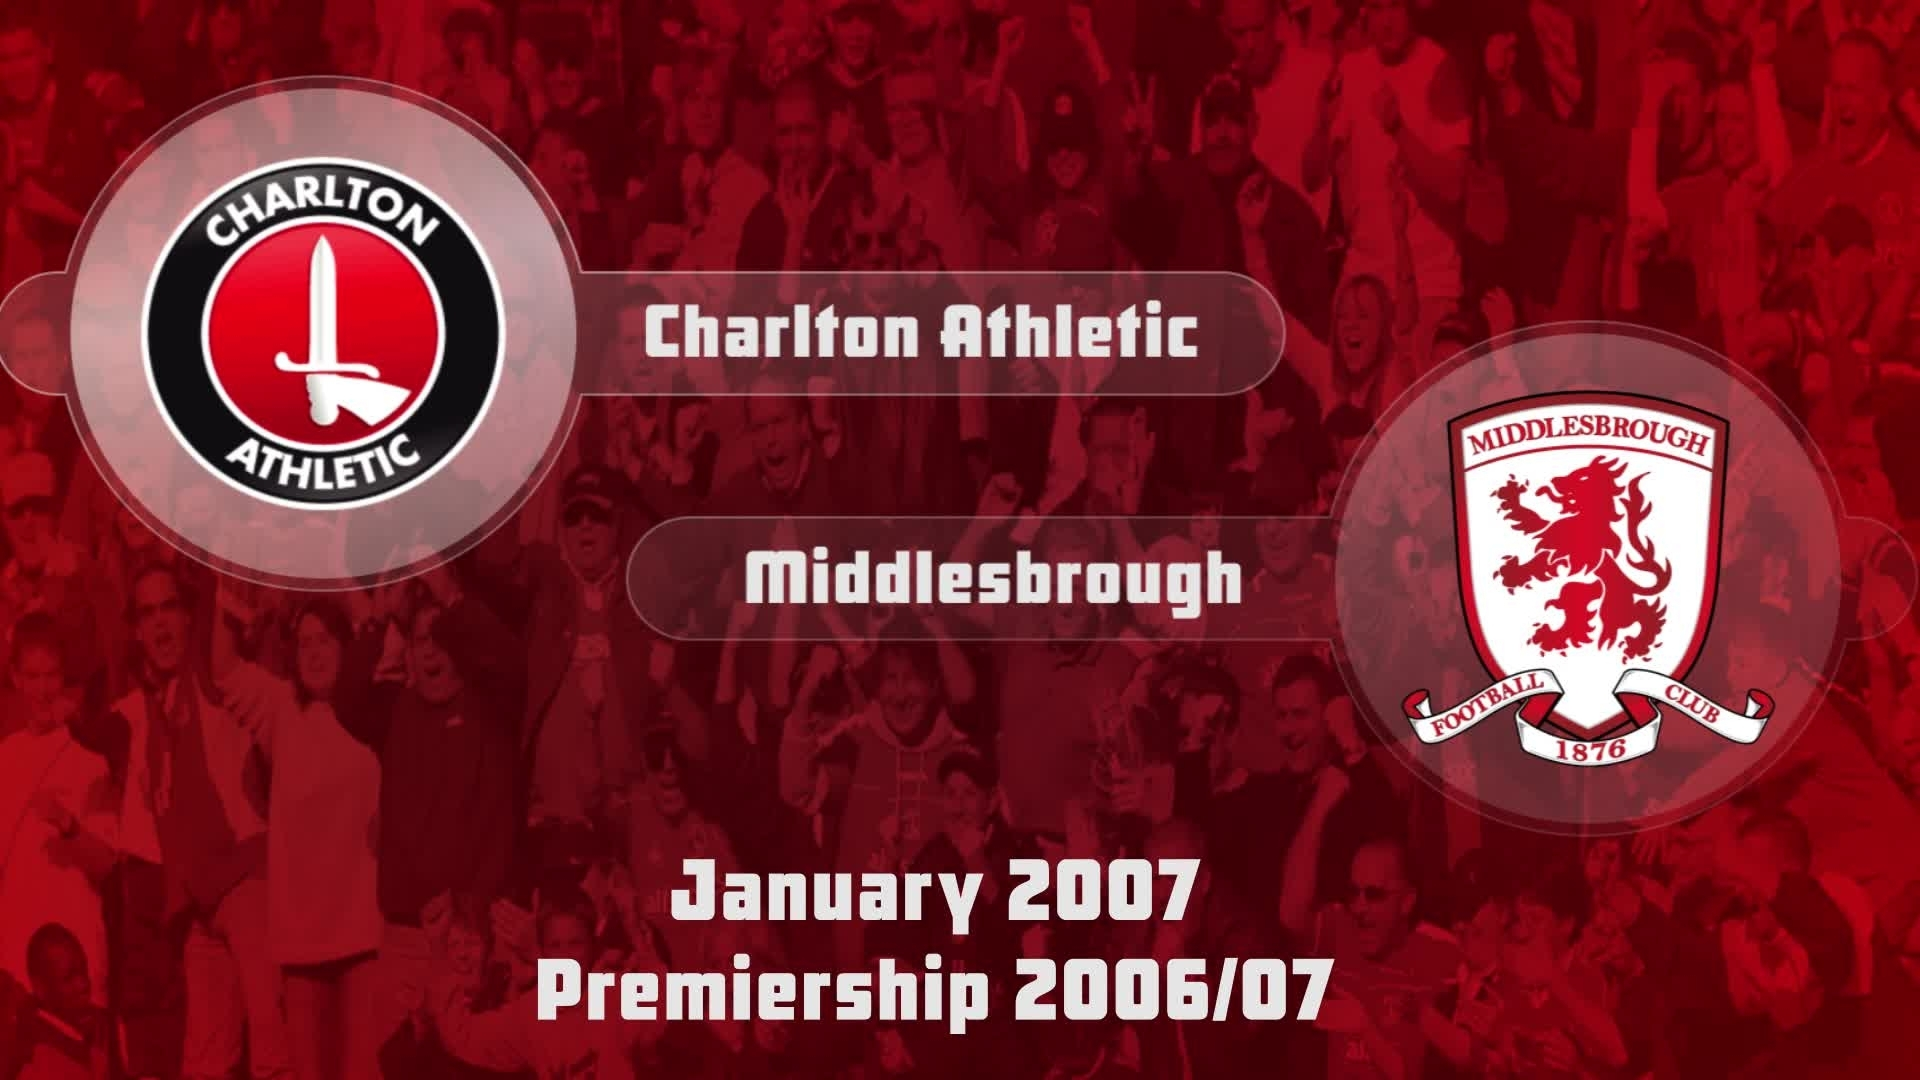 28 HIGHLIGHTS | Charlton 1 Middlesbrough 3 (Jan 2007)